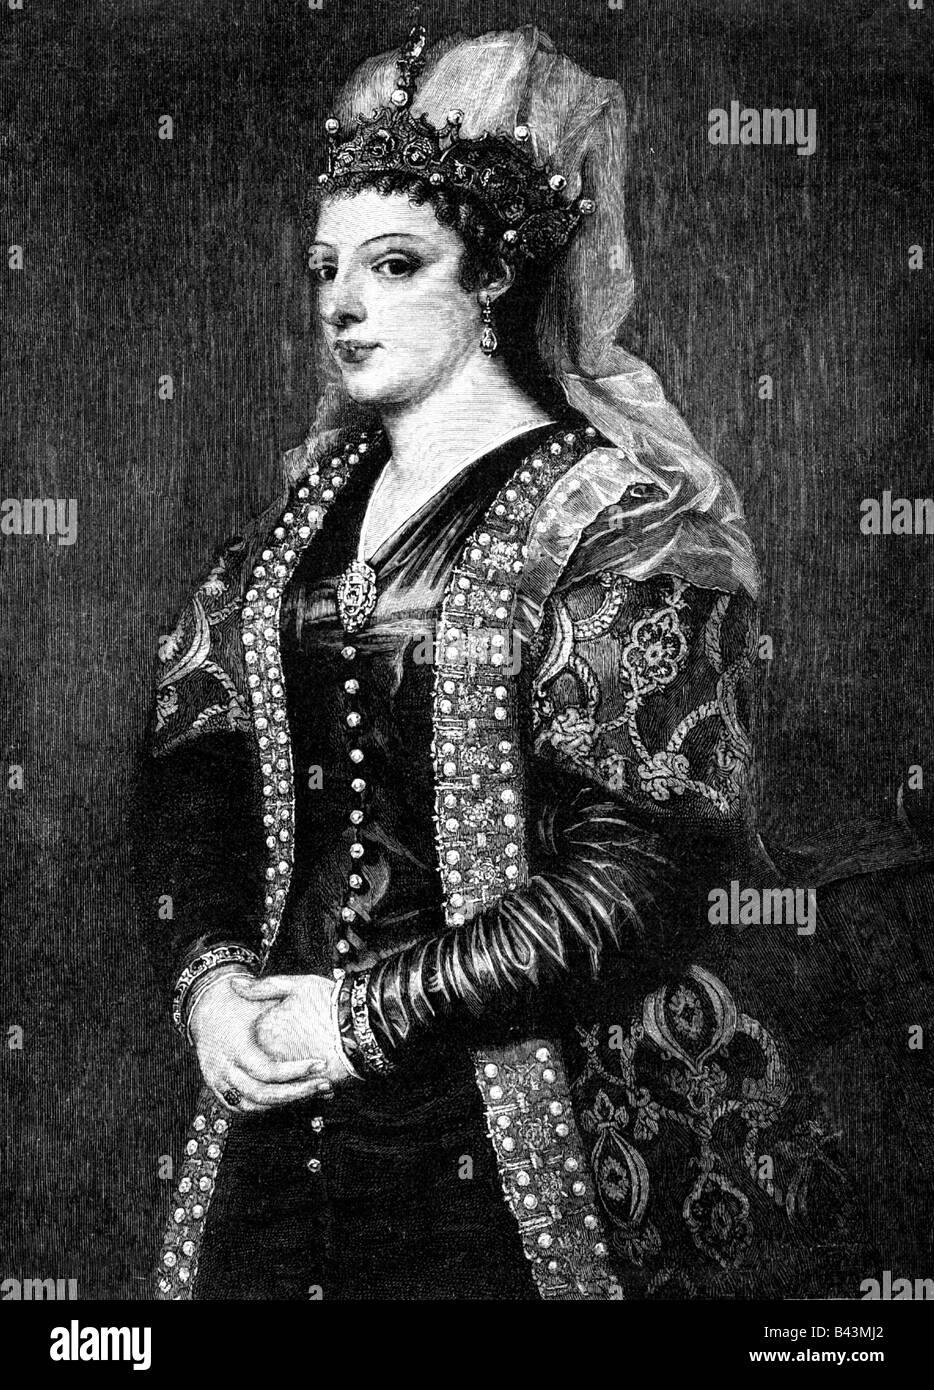 Cornaro, Catarina, 25.11.1454 - 10.7.1510, Queen on Jerusalem, Armenia and Cyprus 1474 - 1489, half length, copper - Stock Image